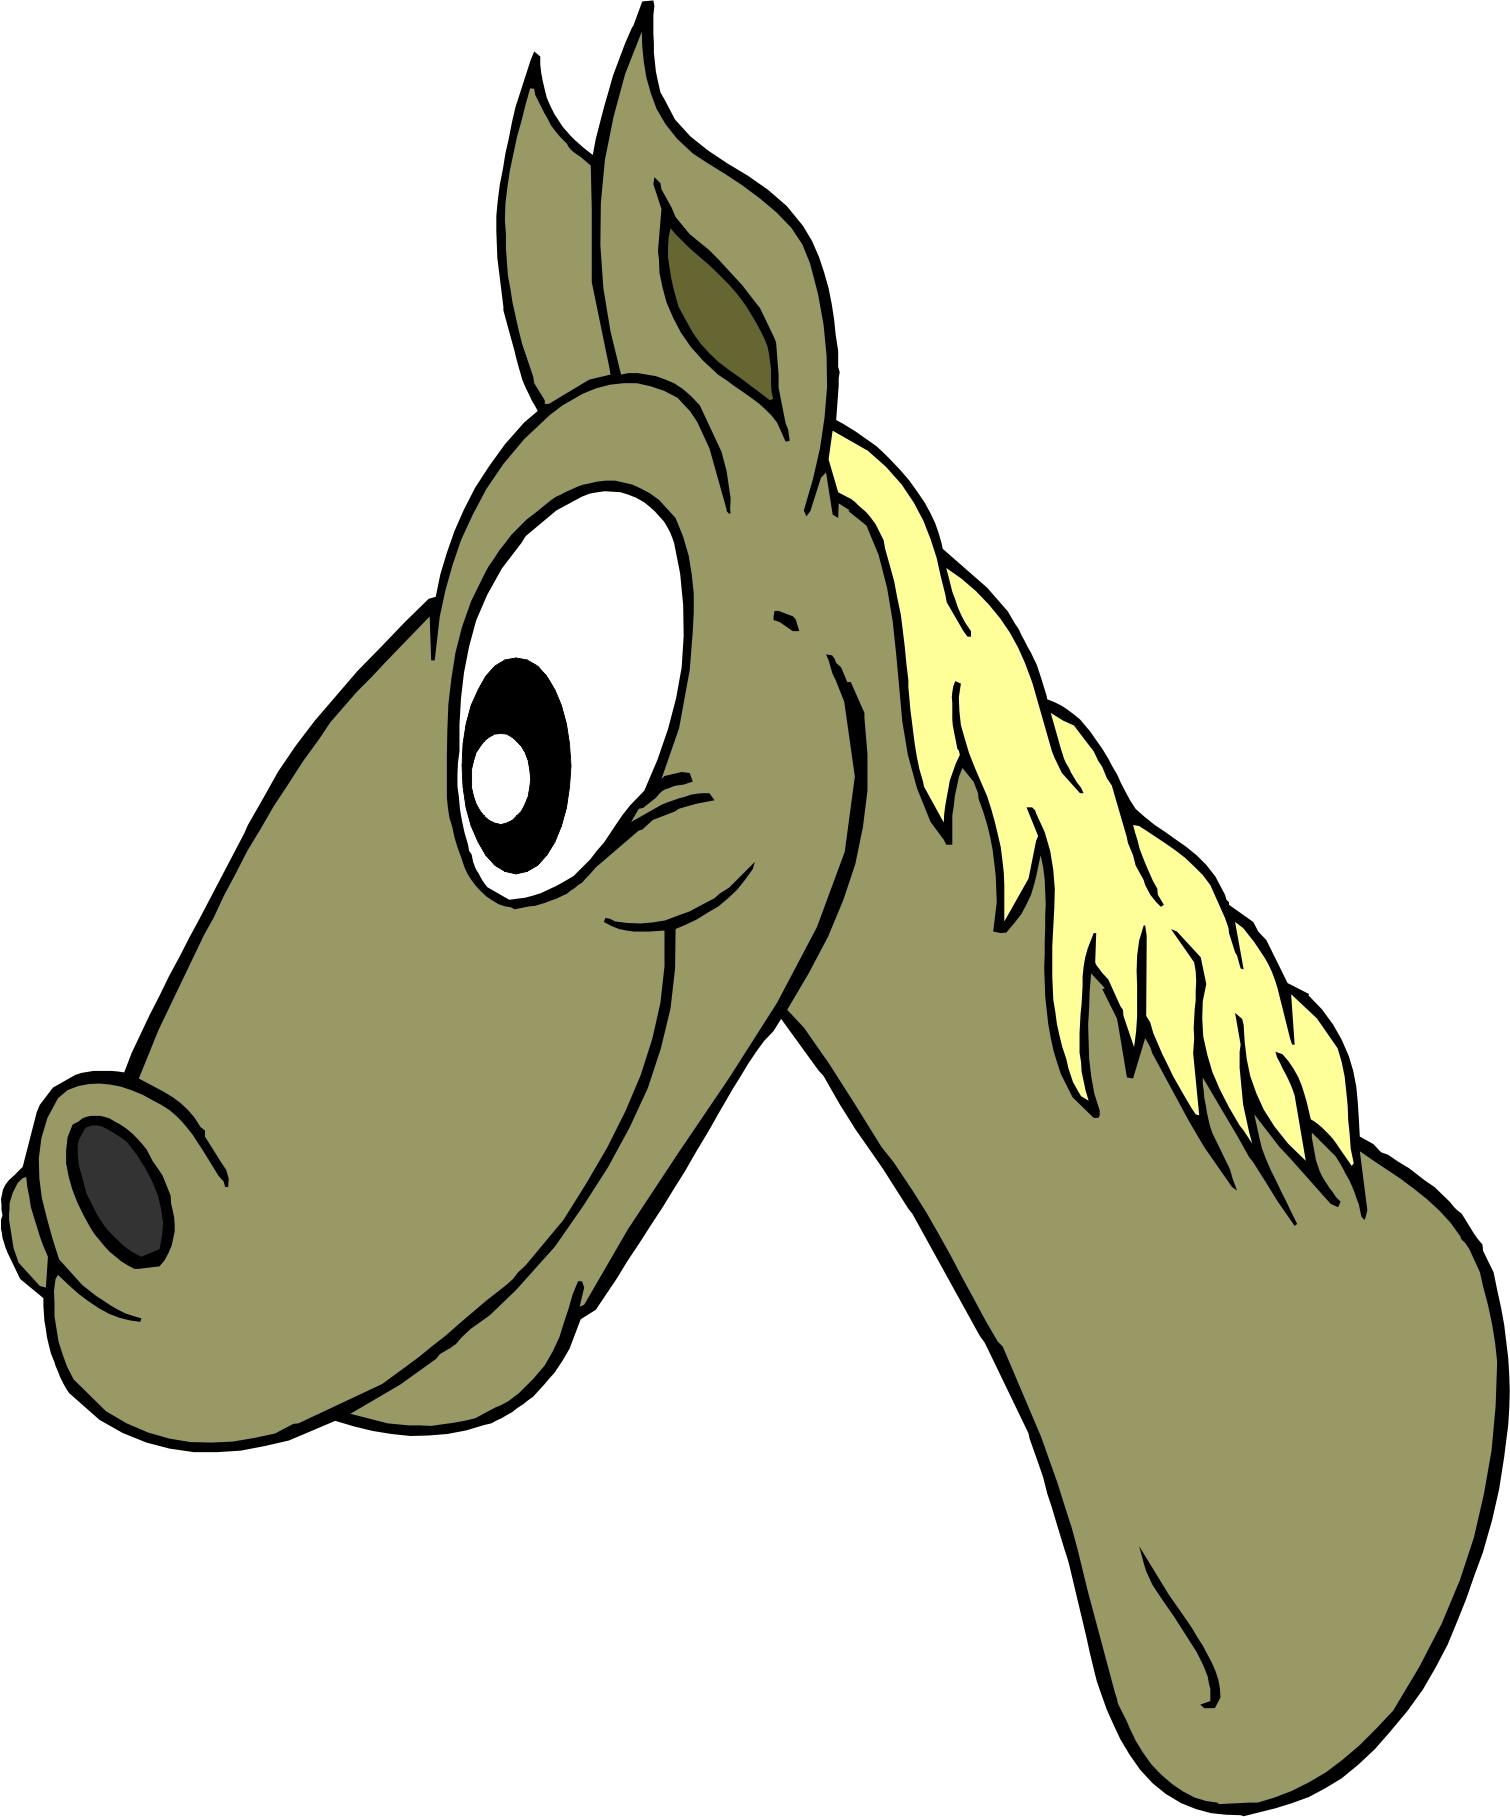 Horse head clip art ar - photo#22